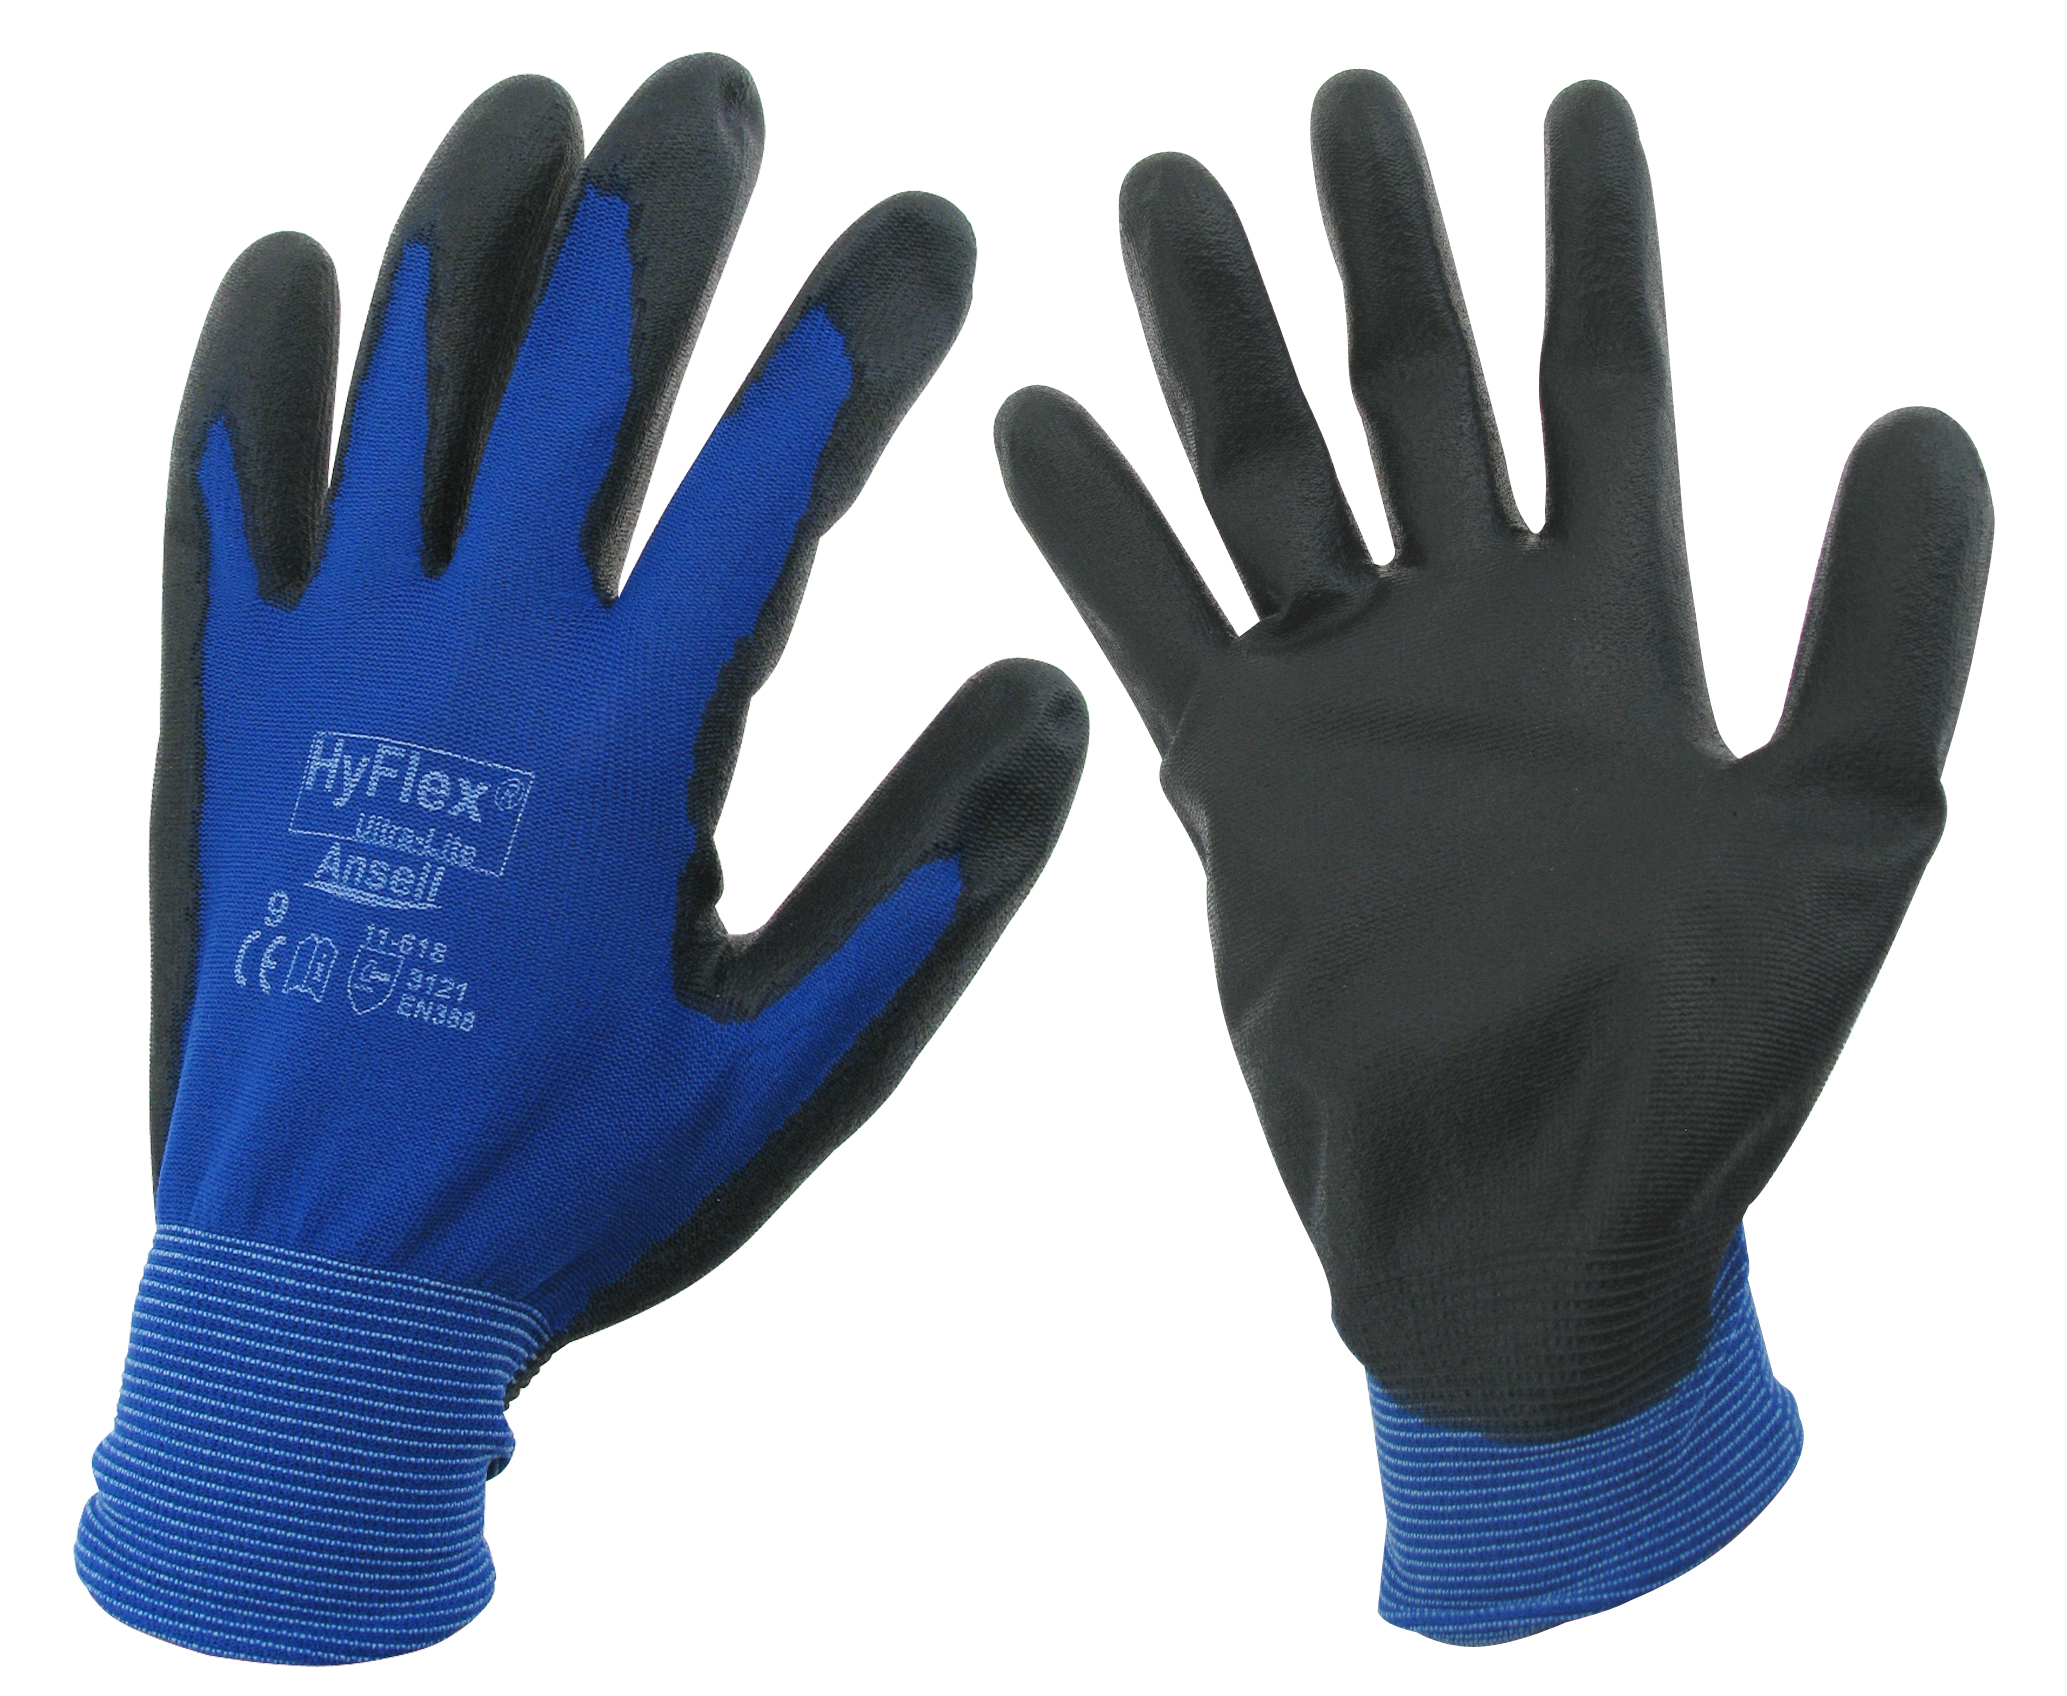 werkhandschoenen mt. 9, PU gecoat, blauw/zwart